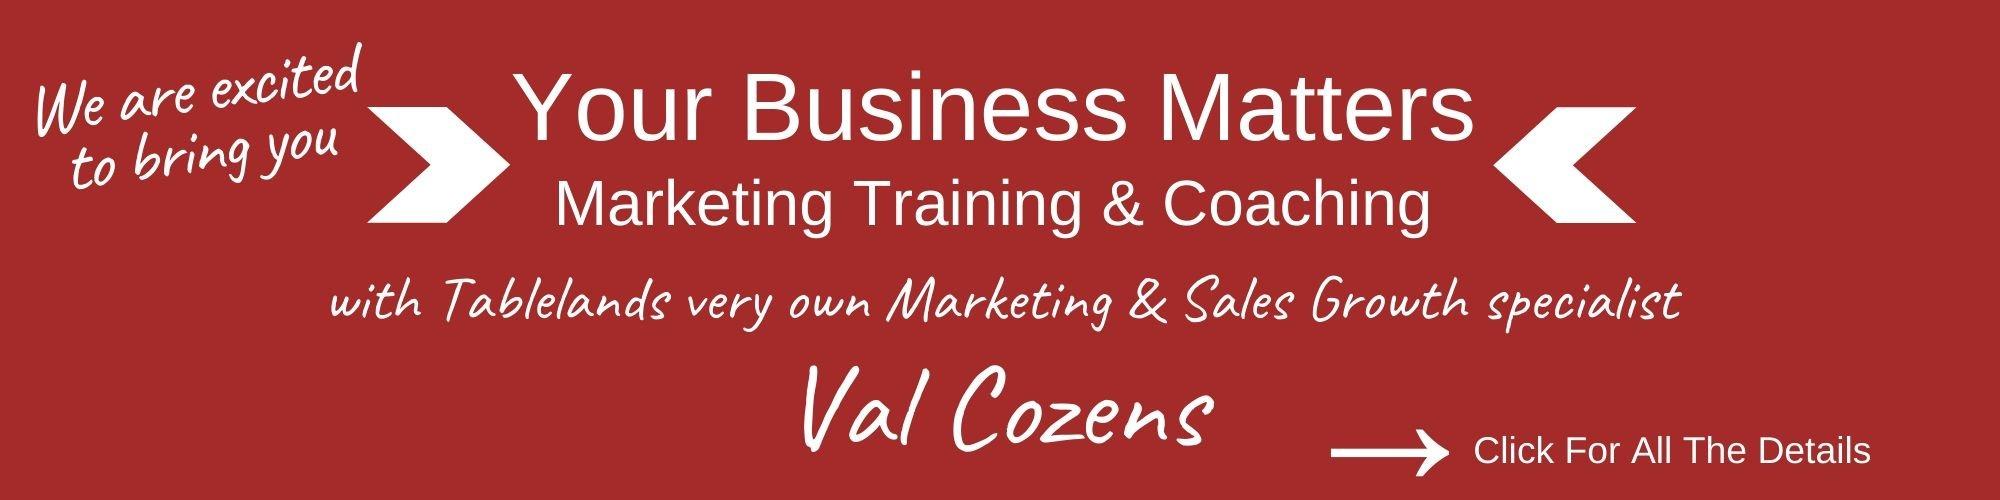 ST Marketing Training red